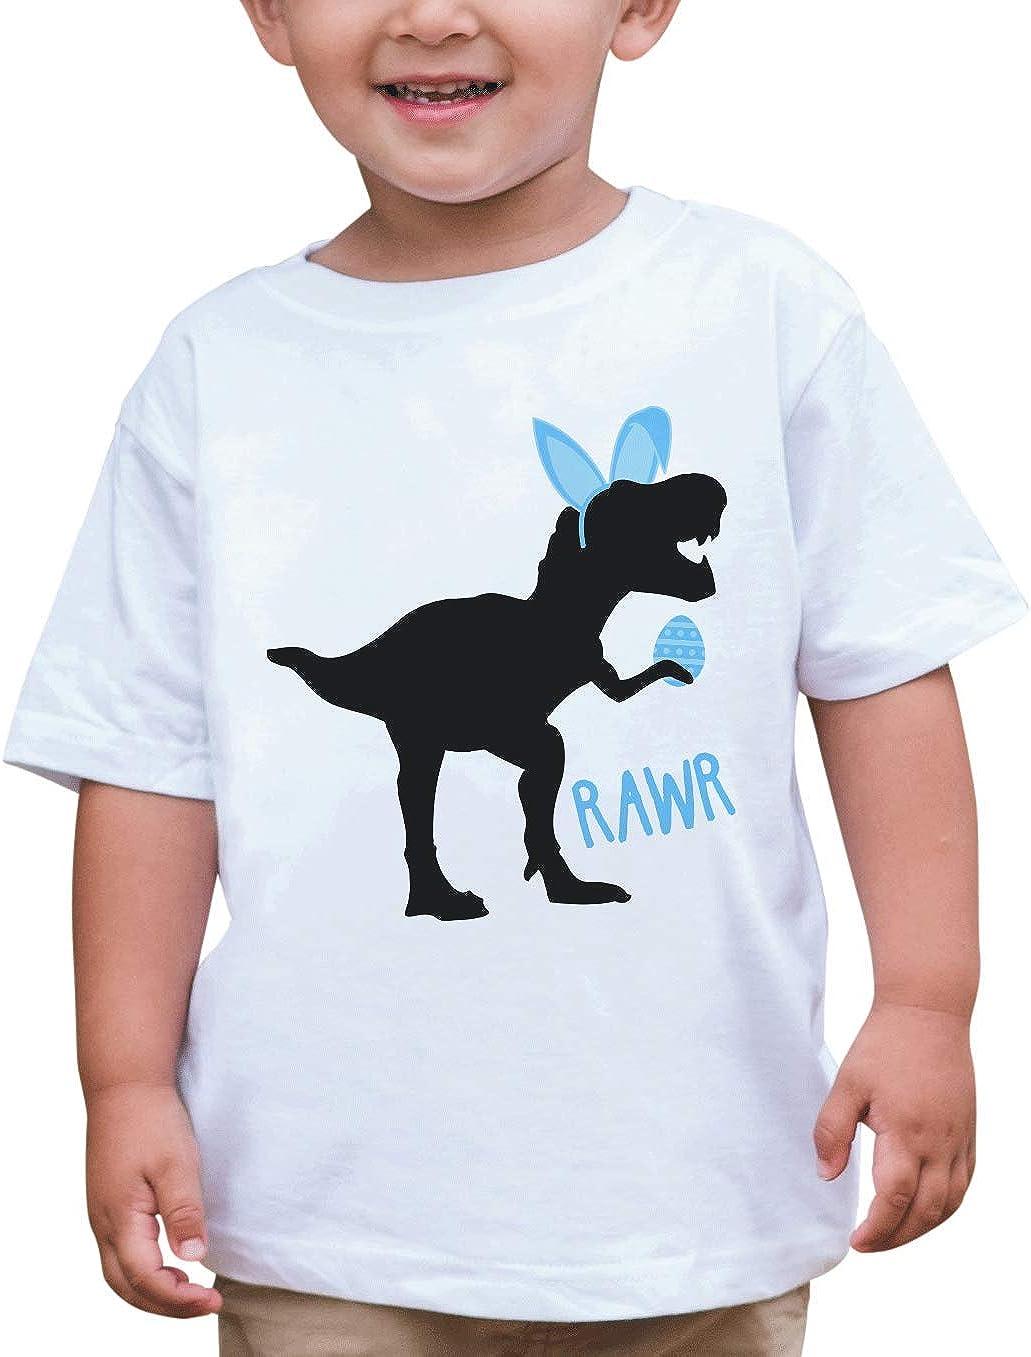 7 ate 9 Apparel Boy's Easter Dinosaur T-Shirt